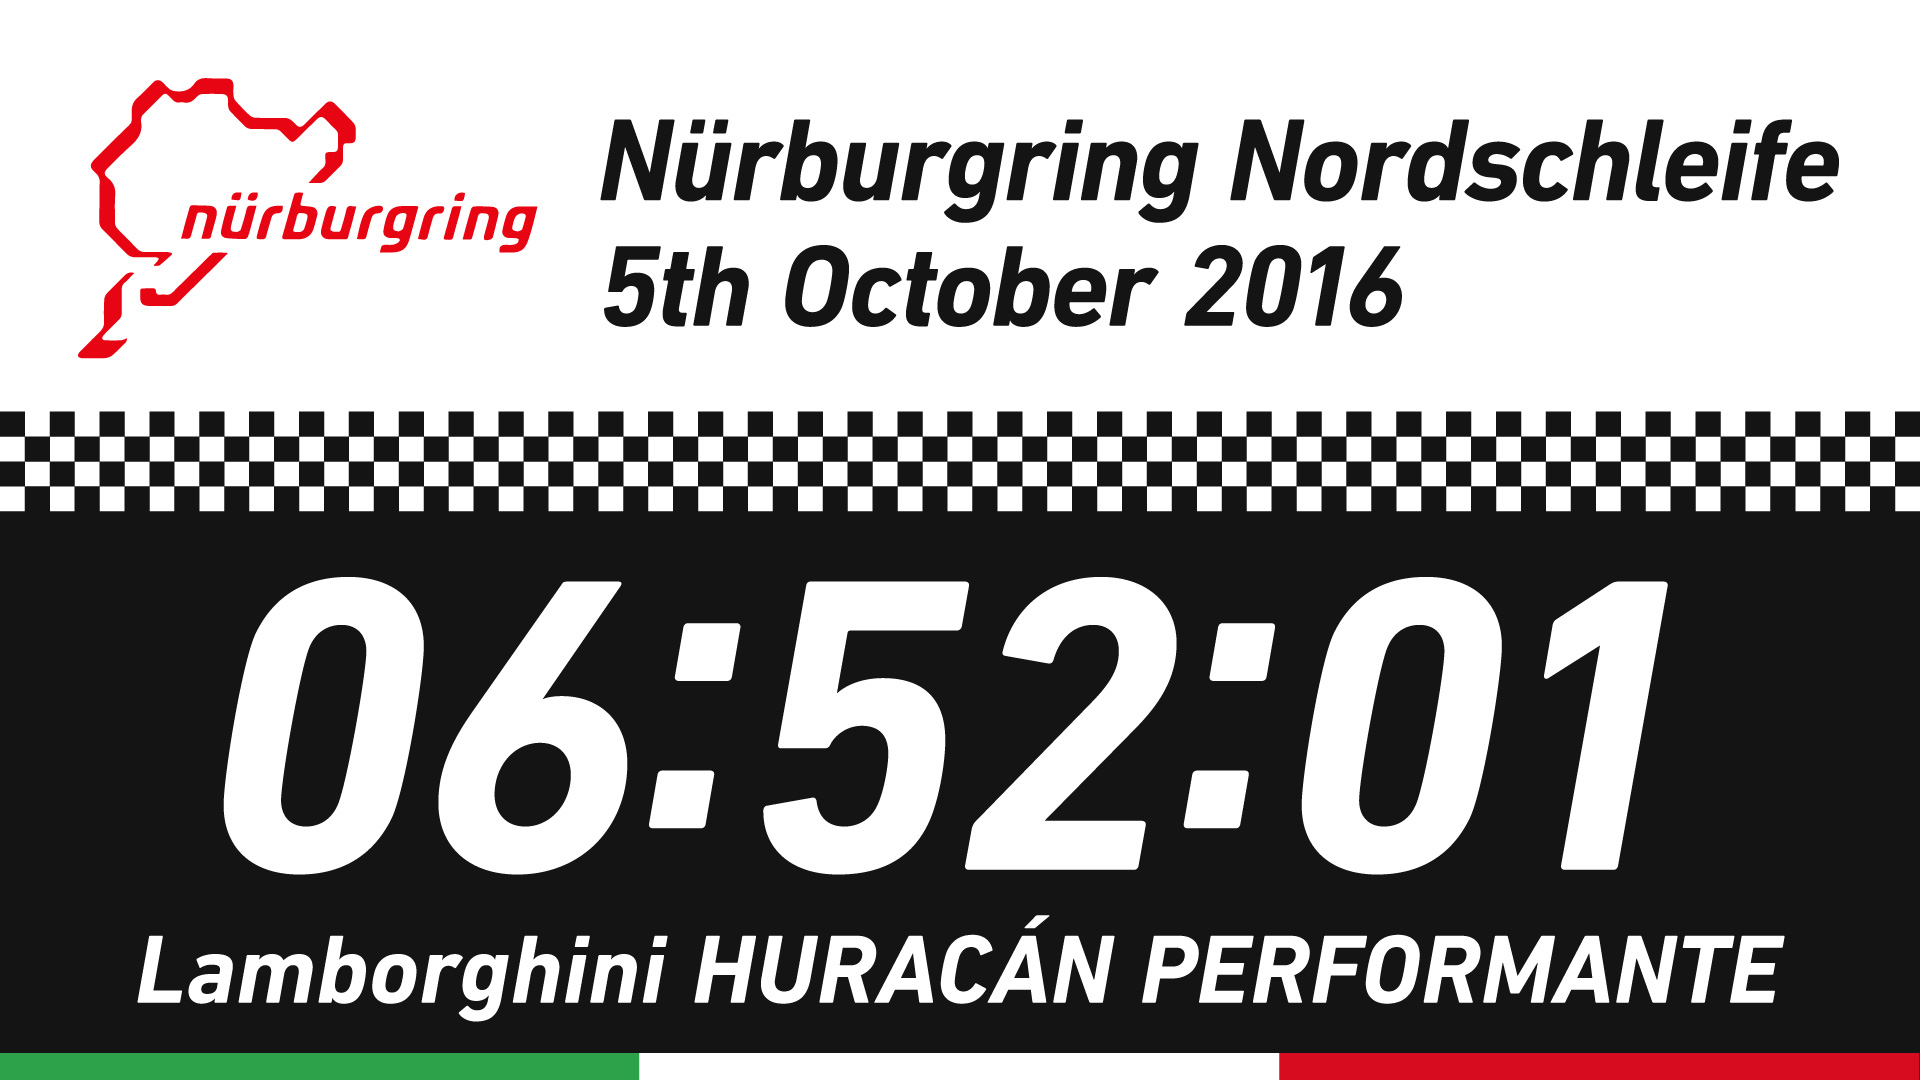 Nürburgring Nordschleife 5 October 2016 6:52:01 Lamborghini HURACÁN PERFORMANTE ランボルギーニ ウラカン ペルフォルマンテ